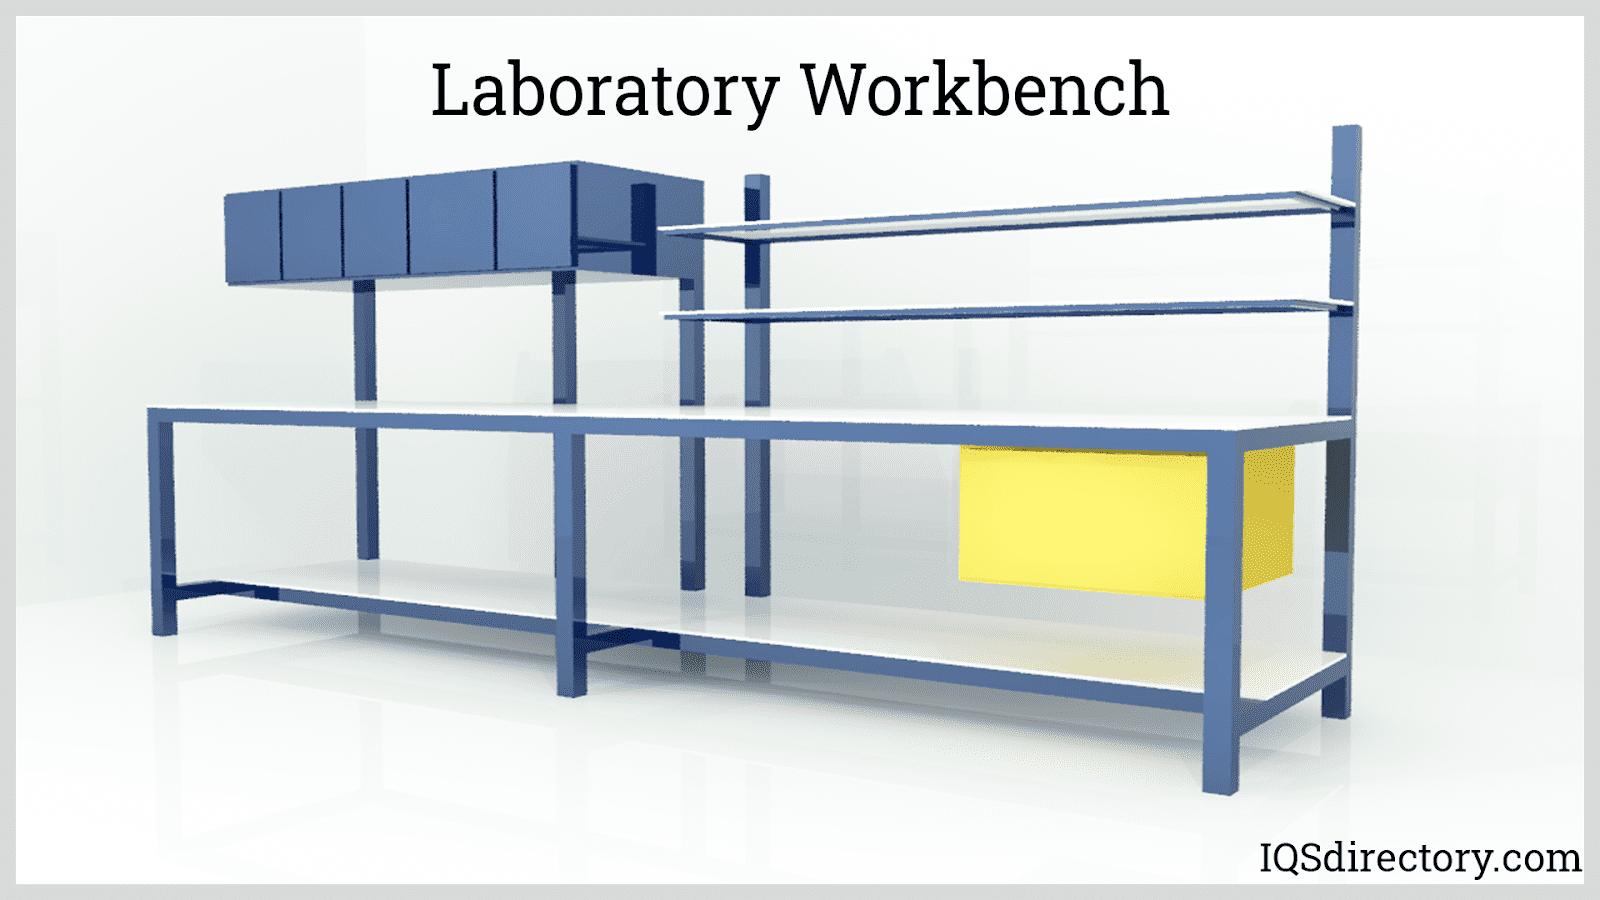 Laboratory Workbench